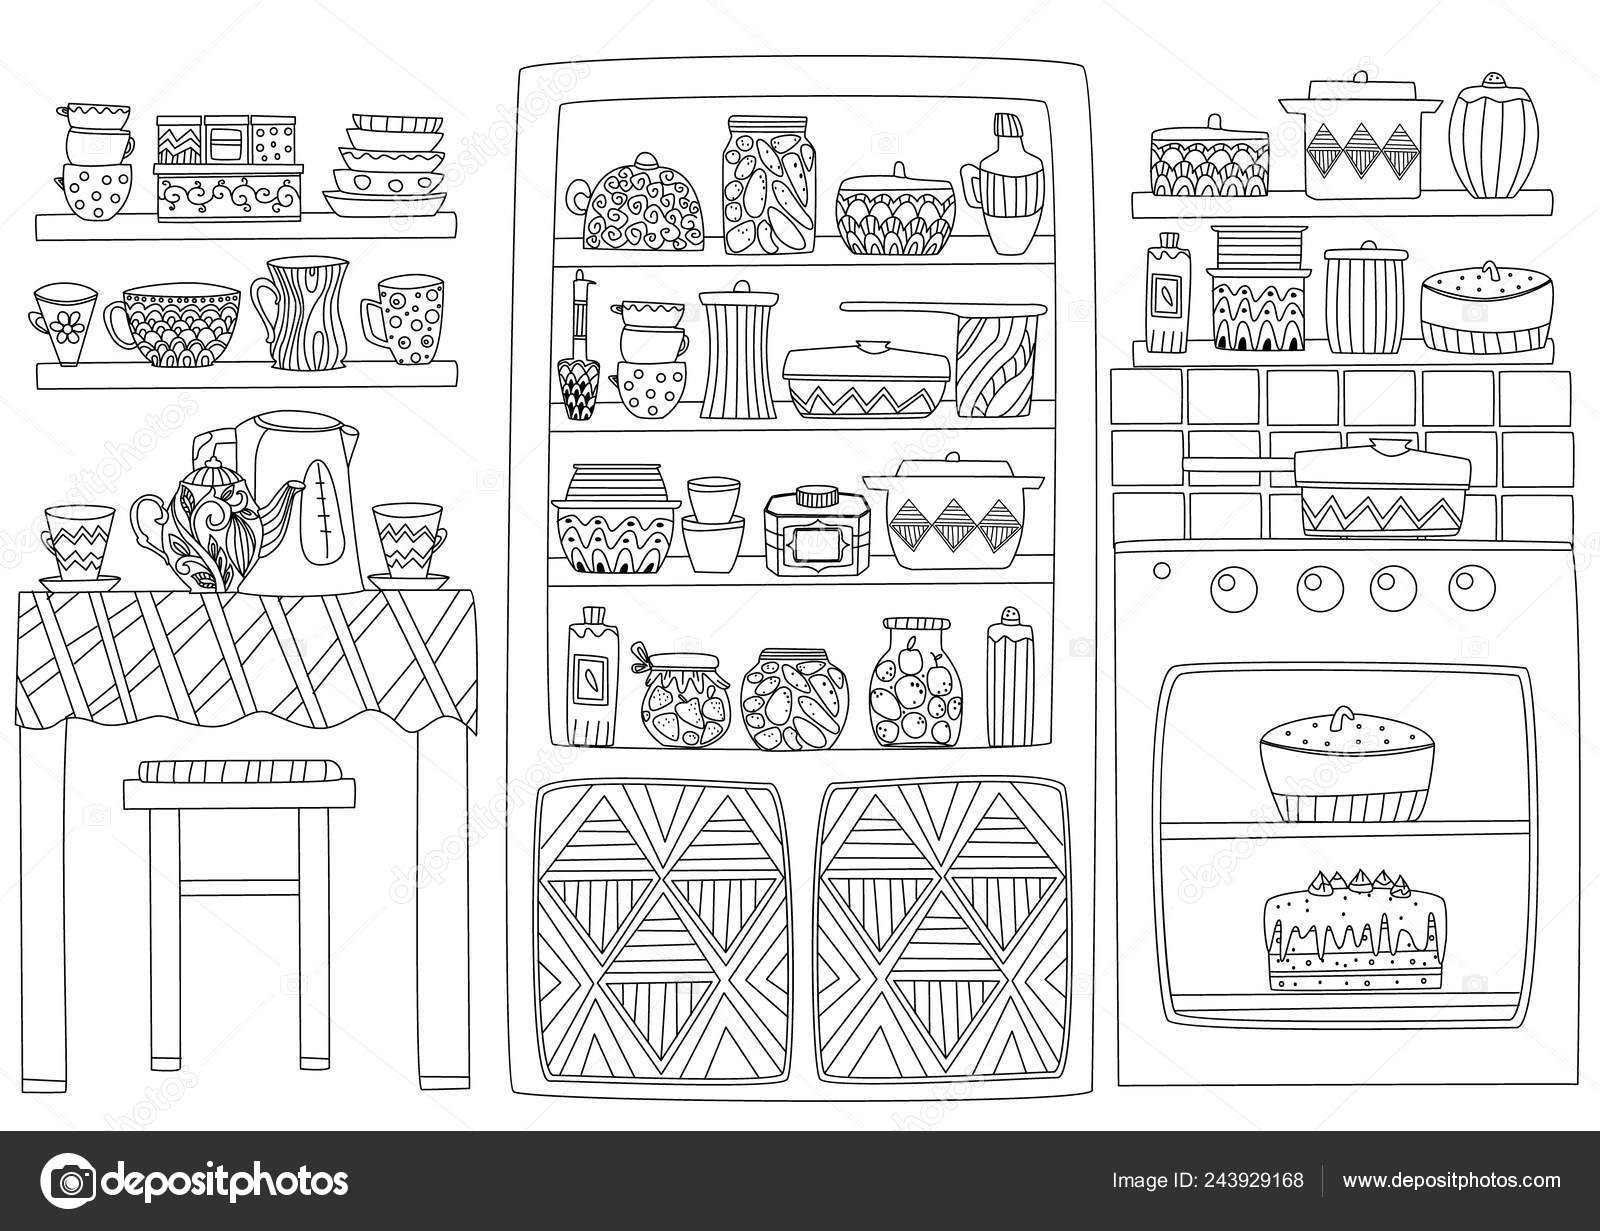 Interior Acogedor Cocina Con Mesa Cocina Armario Estantes